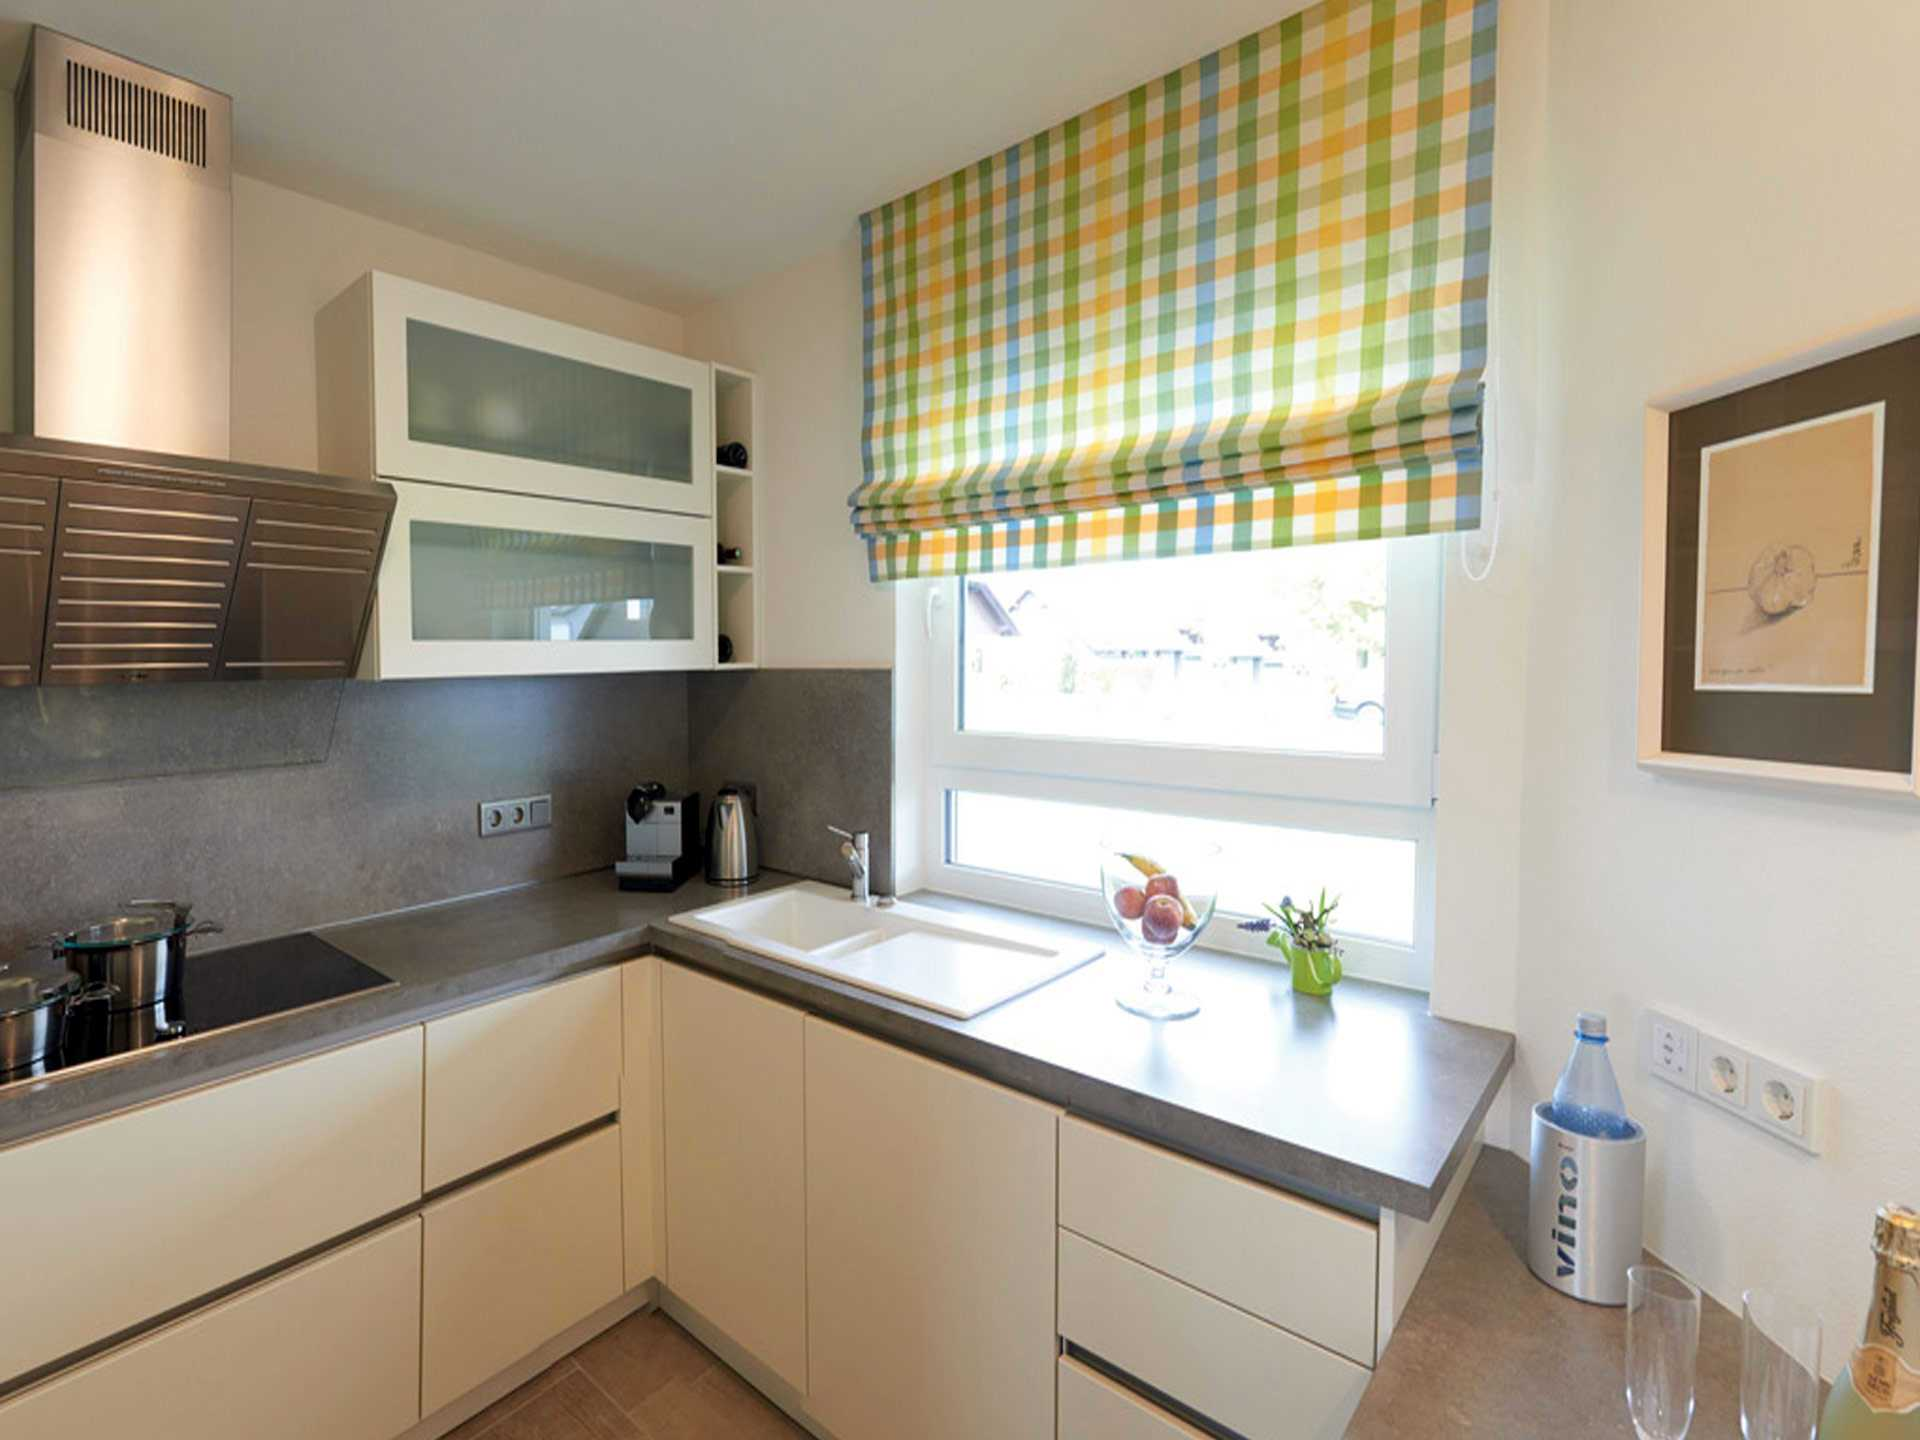 bungalow suno fingerhut haus. Black Bedroom Furniture Sets. Home Design Ideas